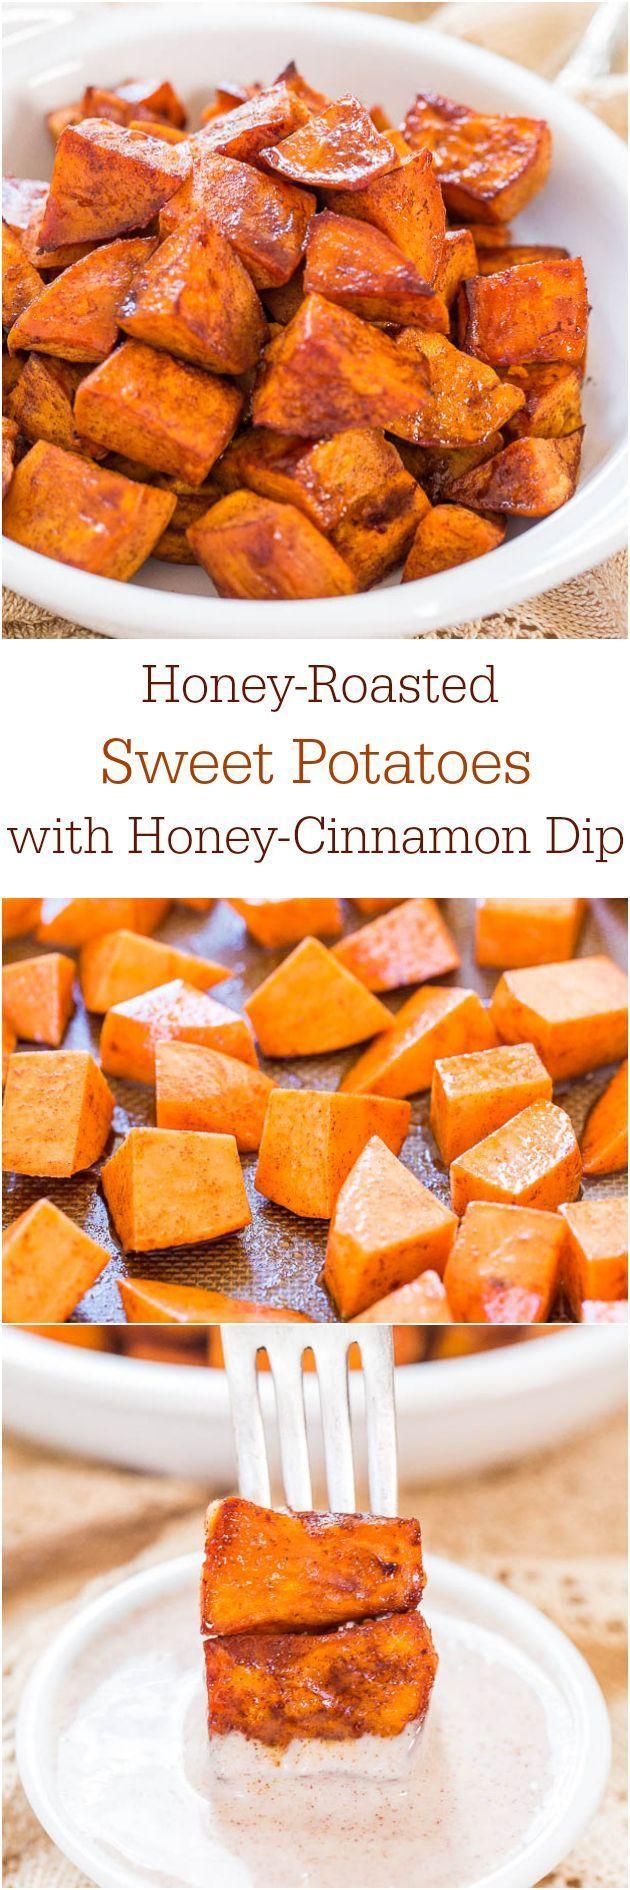 Honey-Roasted Sweet Potatoes with Honey-Cinnamon Dip - The honey glaze and the…